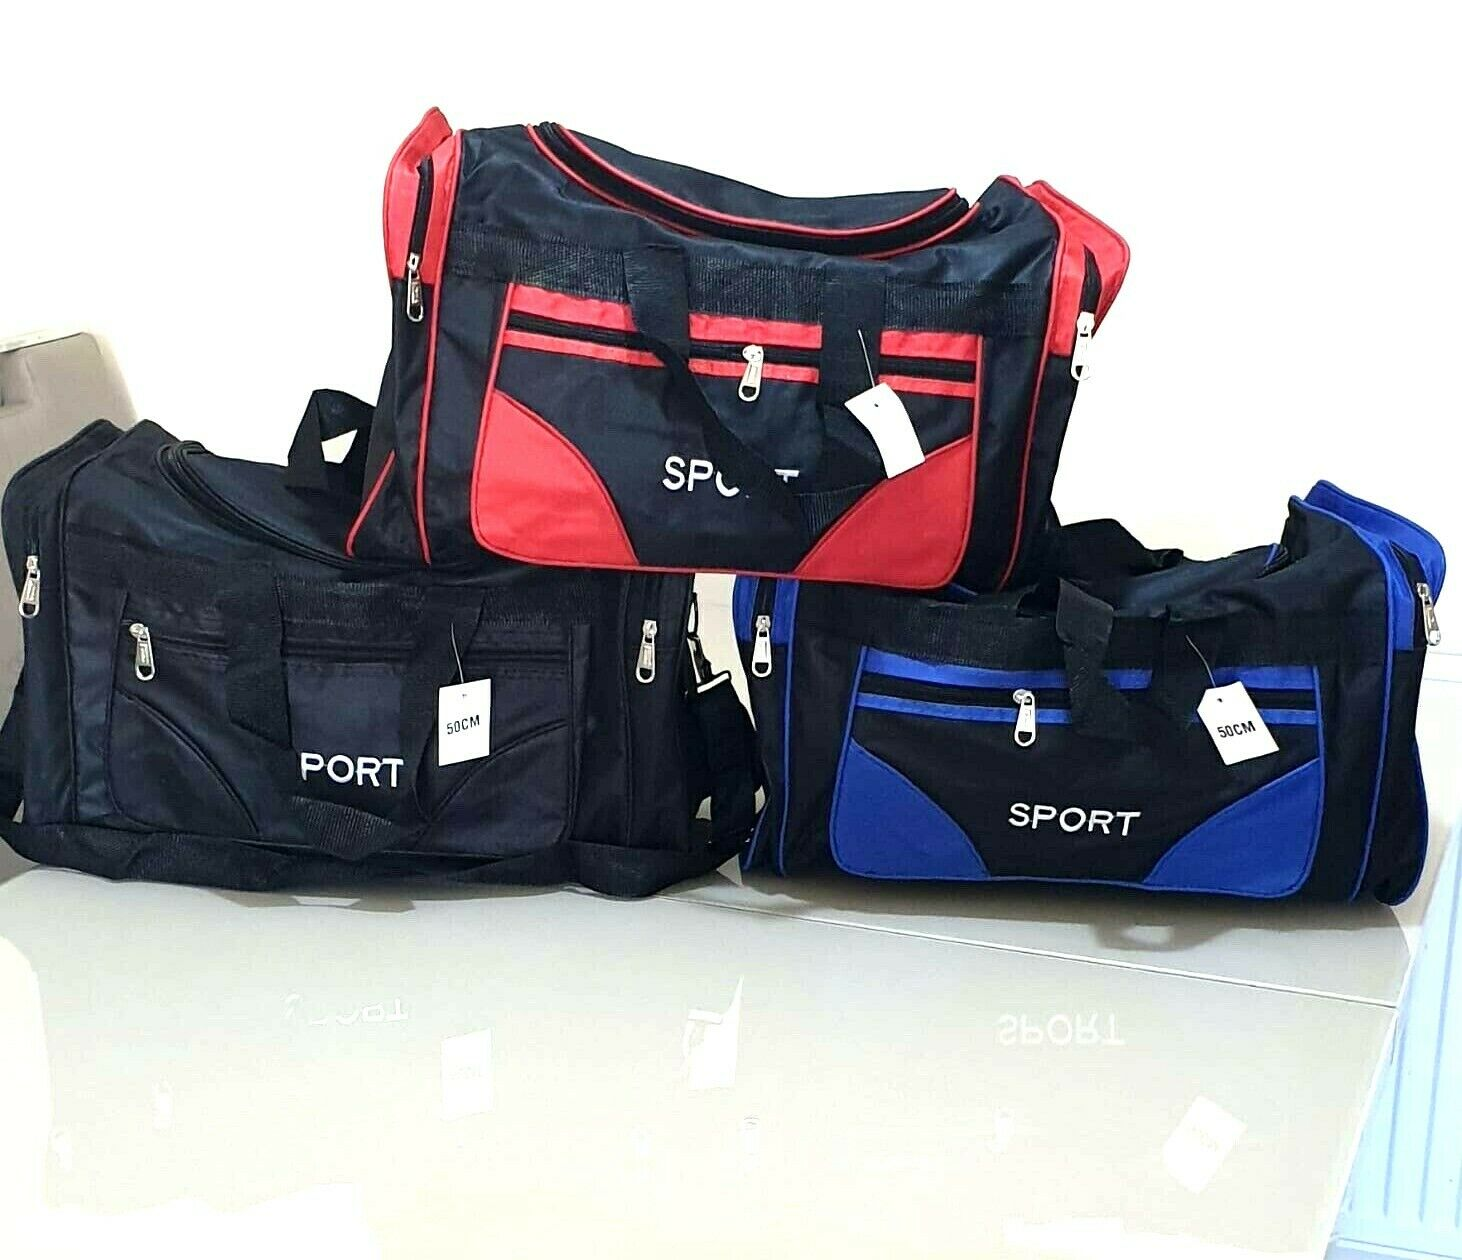 Samsonite Travel Accessories Travelling Bag Duffle Sports Bag 55 Cm Black For Sale Ebay